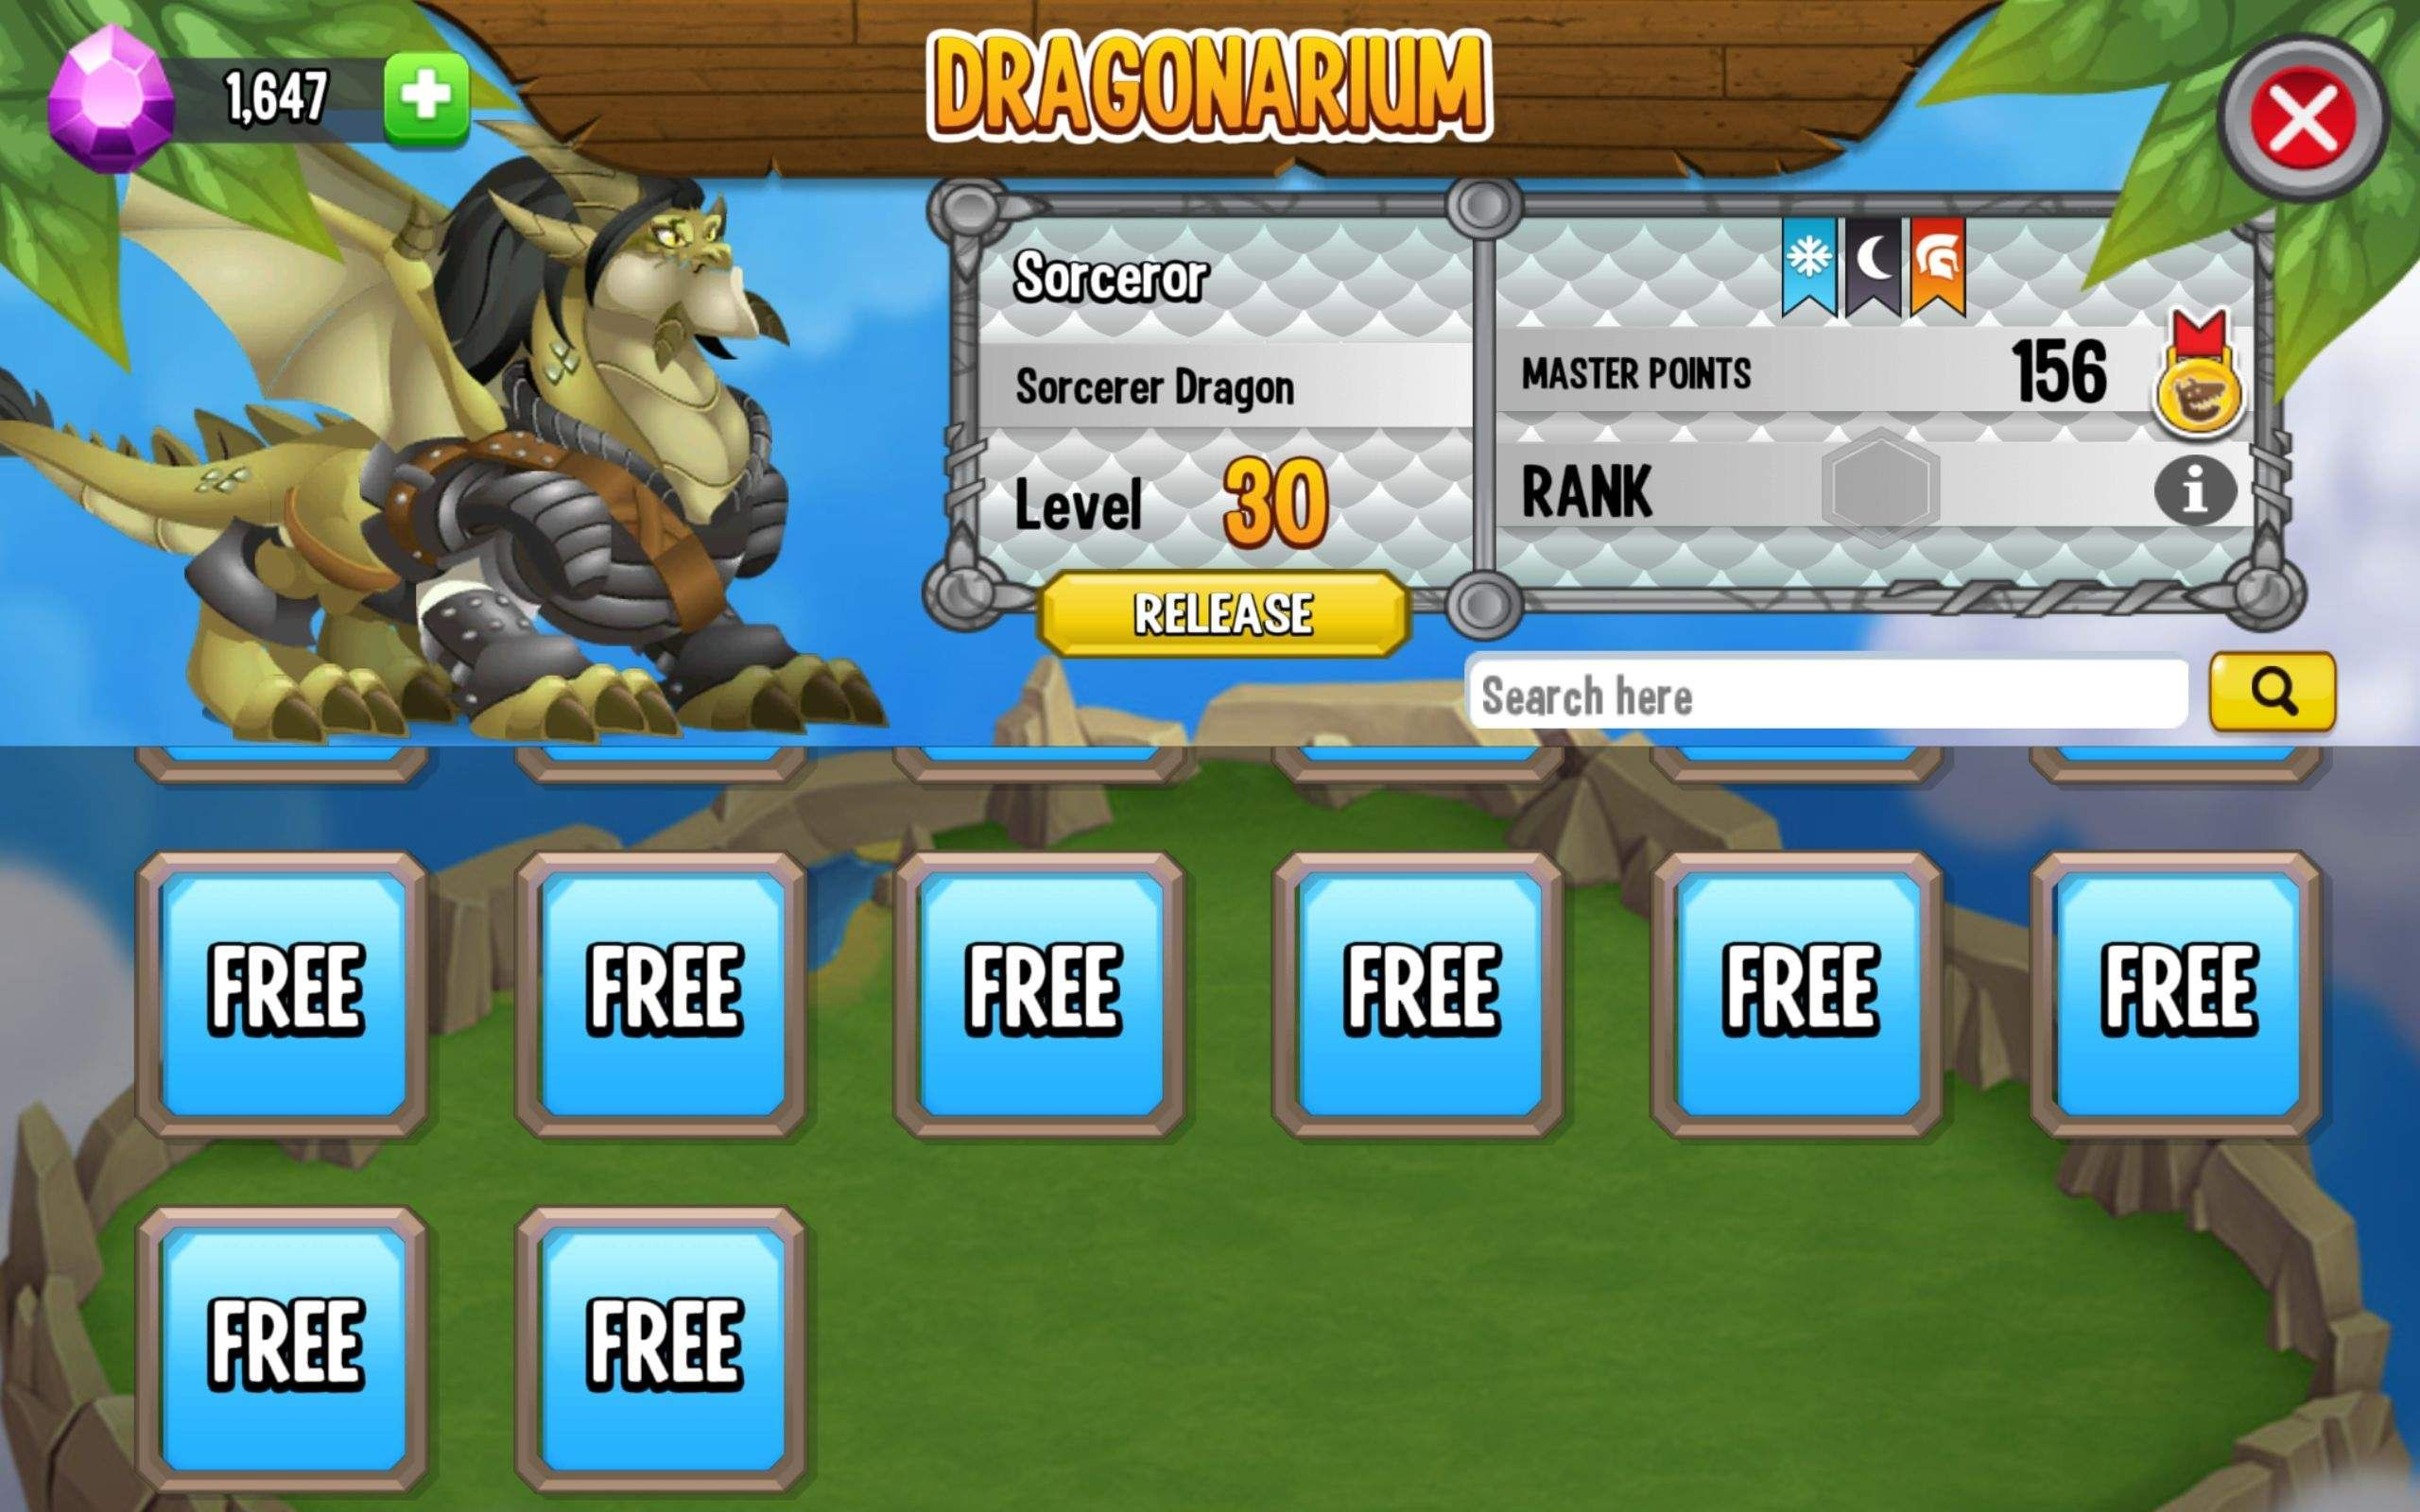 0_1587235569710_041820 800 dragonarium slots.jpg